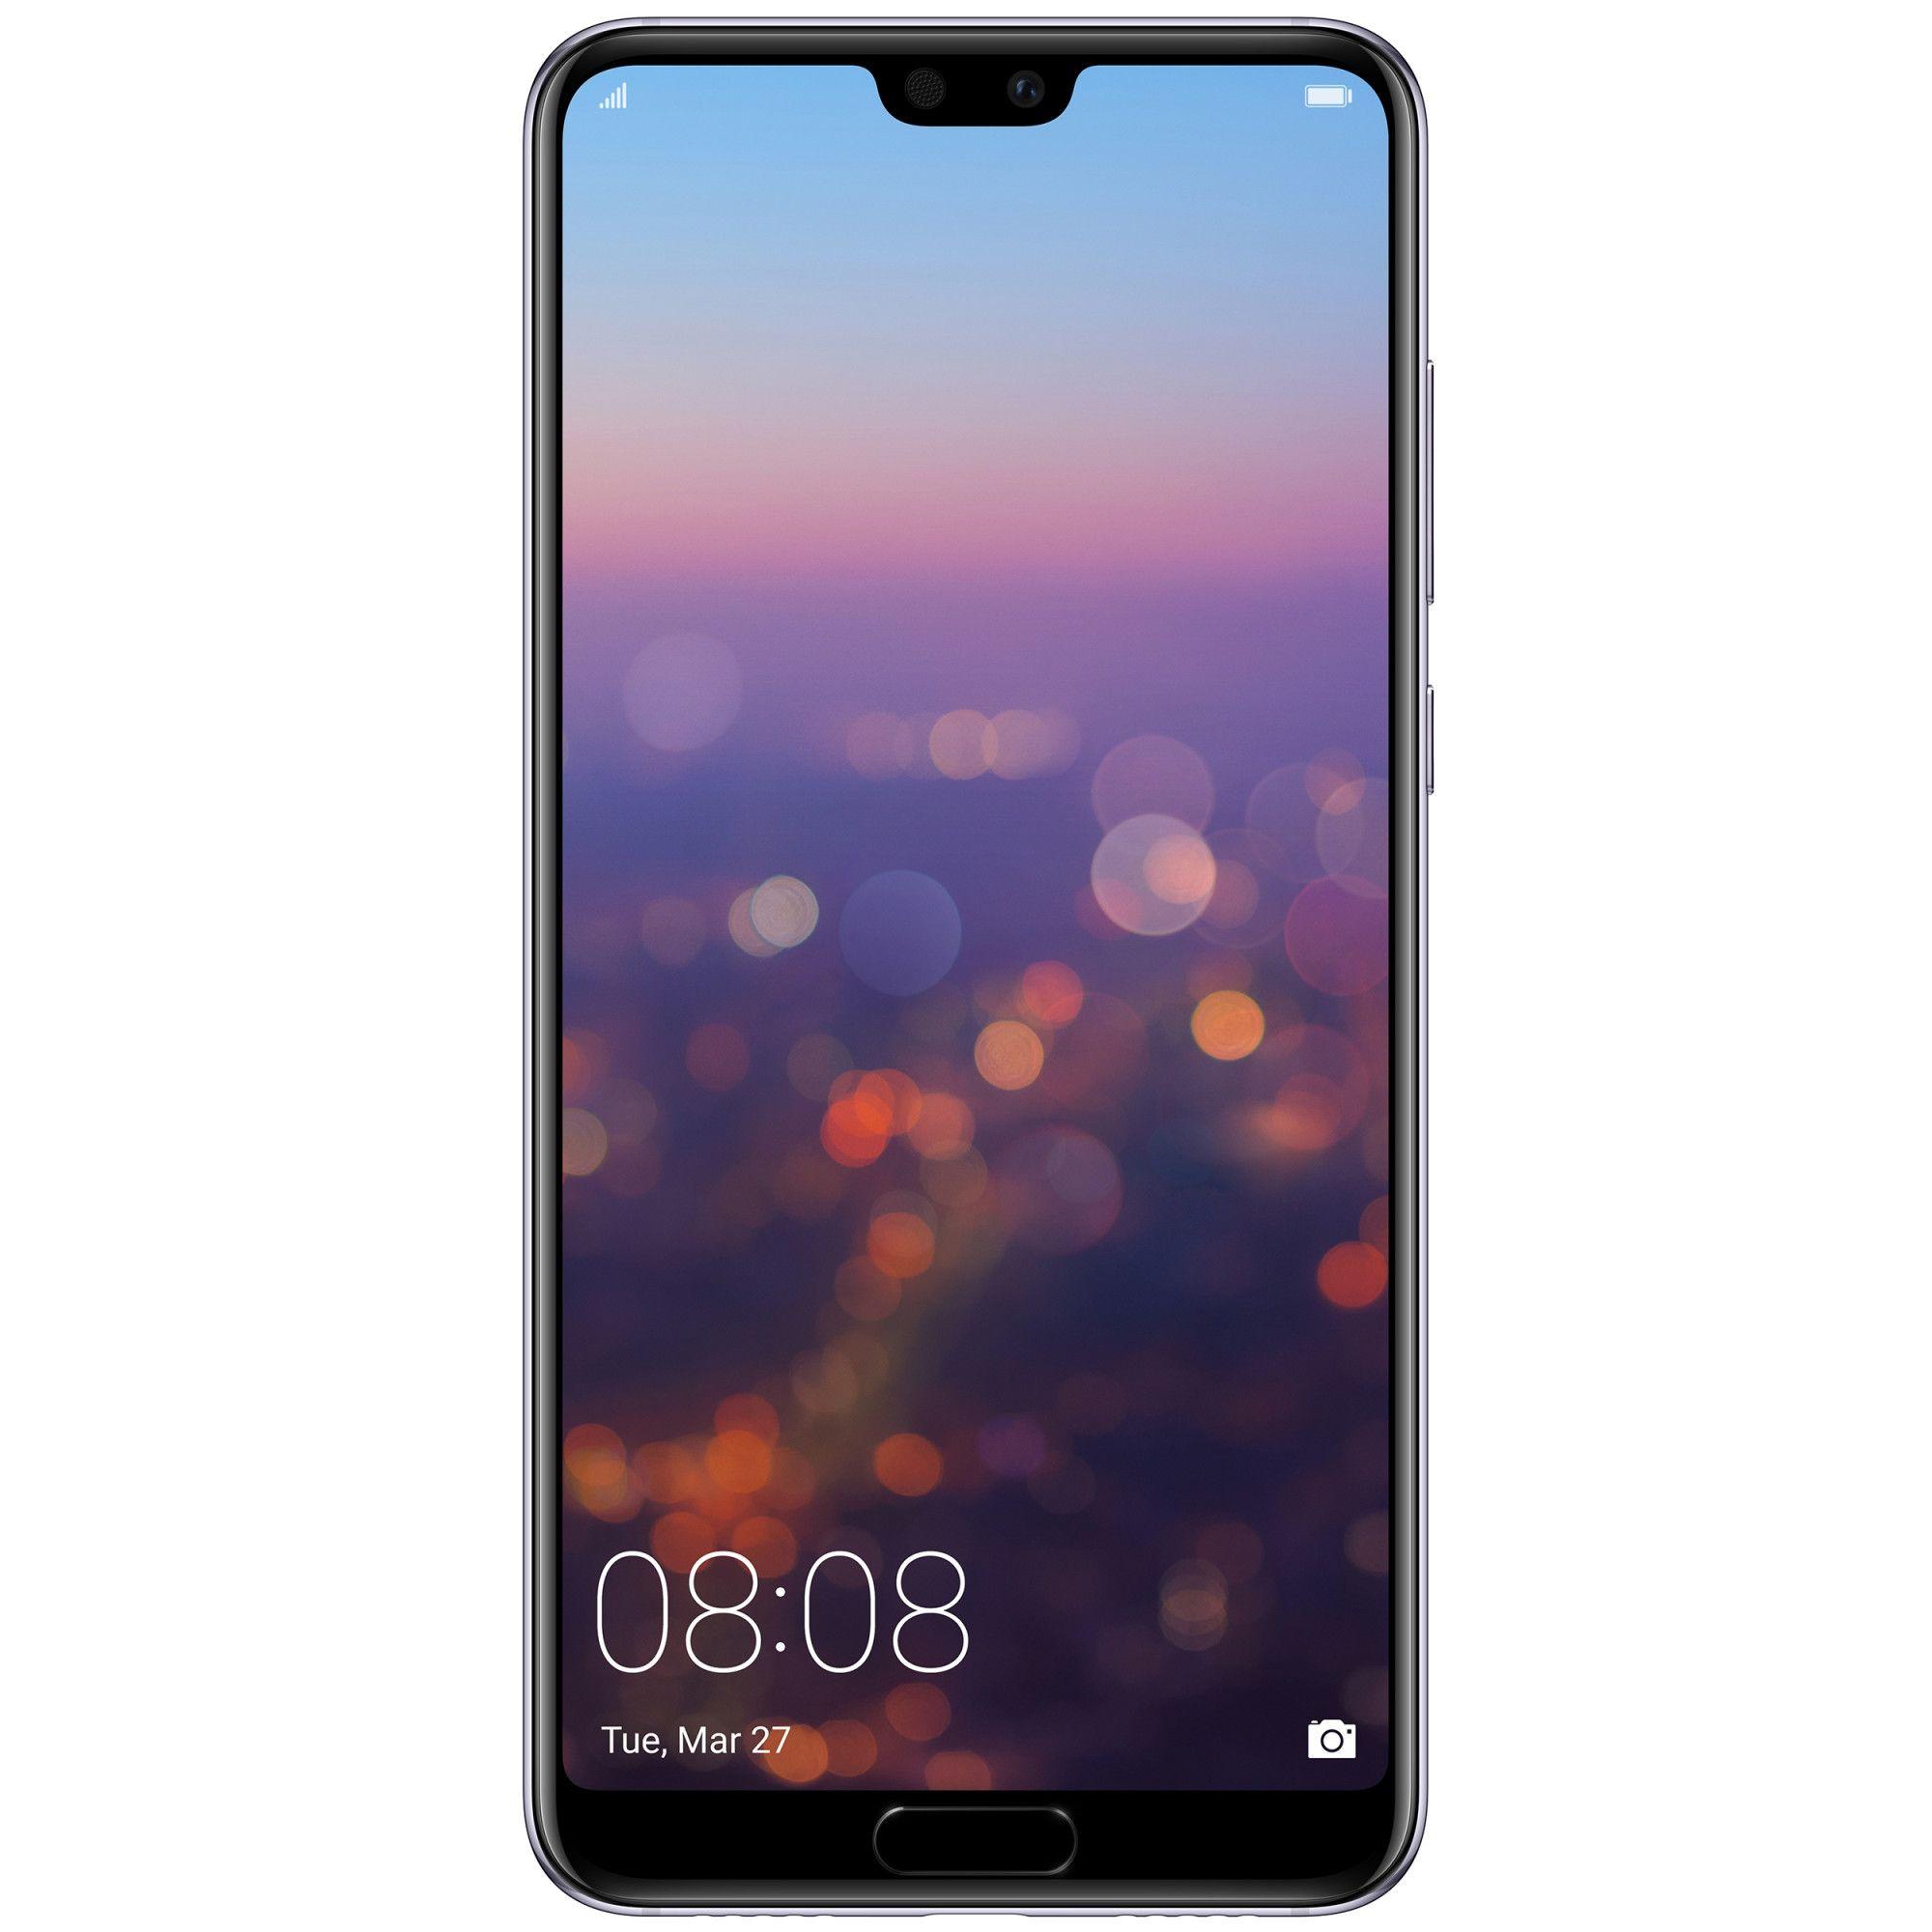 Telefon Mobil Huawei P20 Pro 128GB Flash 6GB RAM Dual SIM 4G Twilight